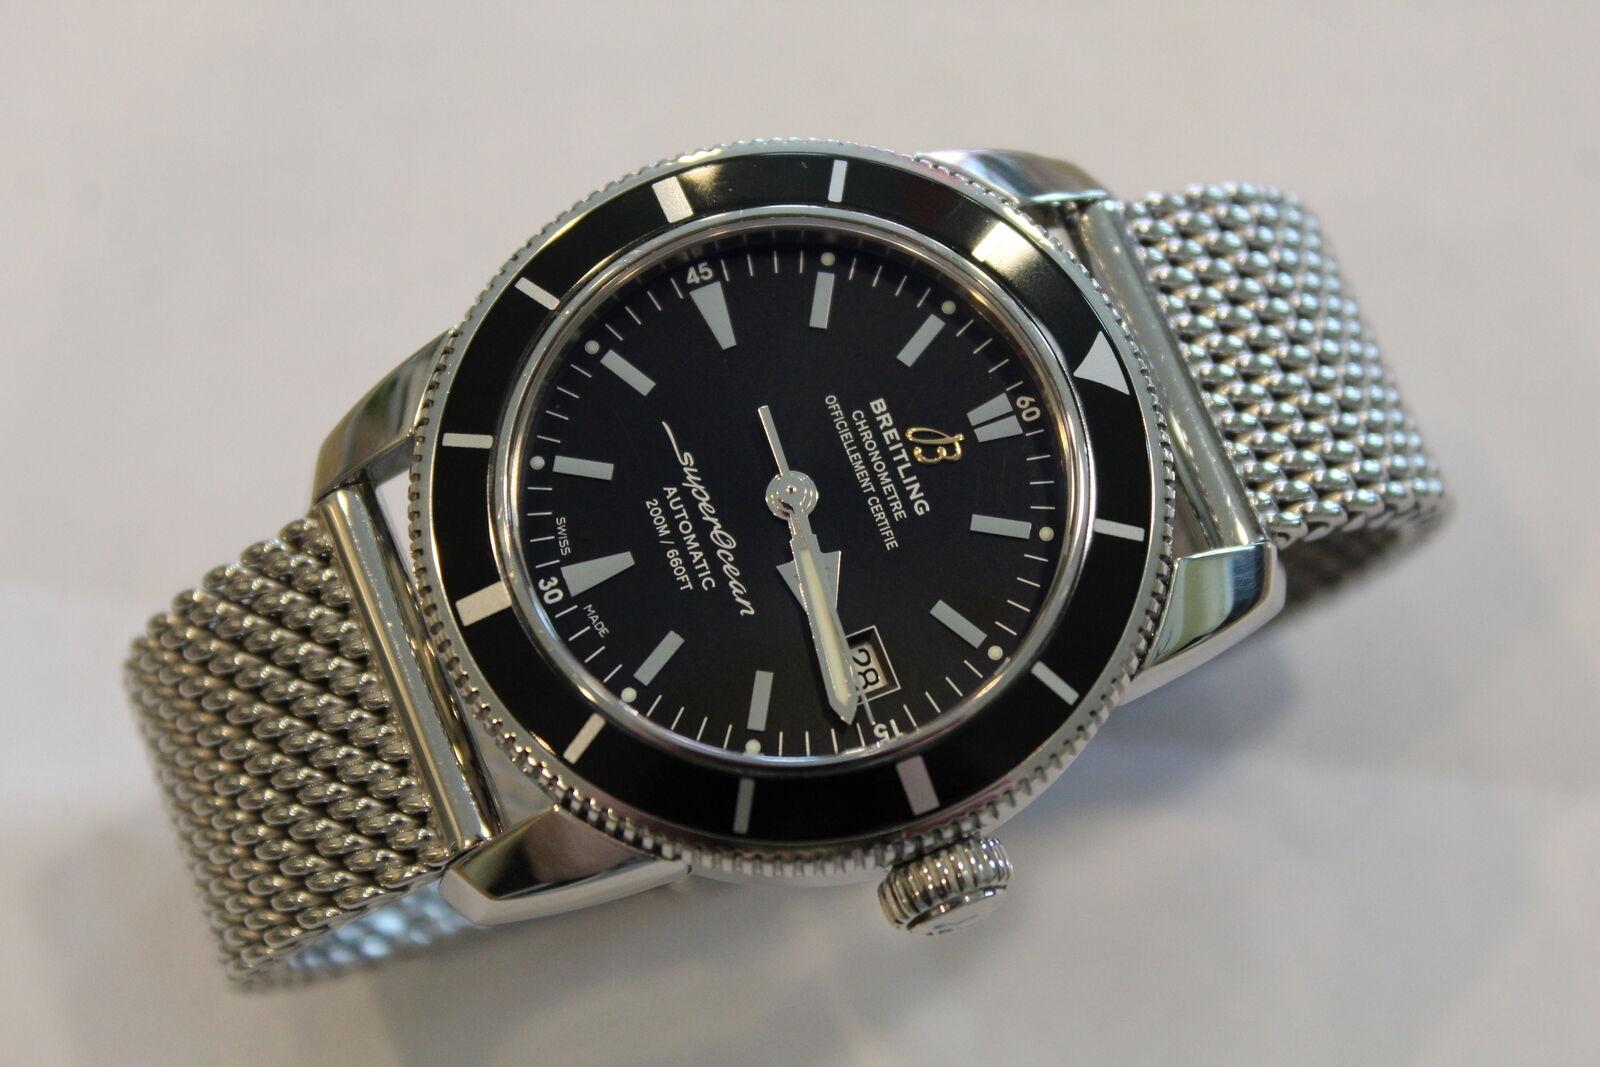 Breitling SuperOcean Heritage Black Bezel/Dial 42mm A17321 Mens Watch w OEM Mesh - watch picture 1